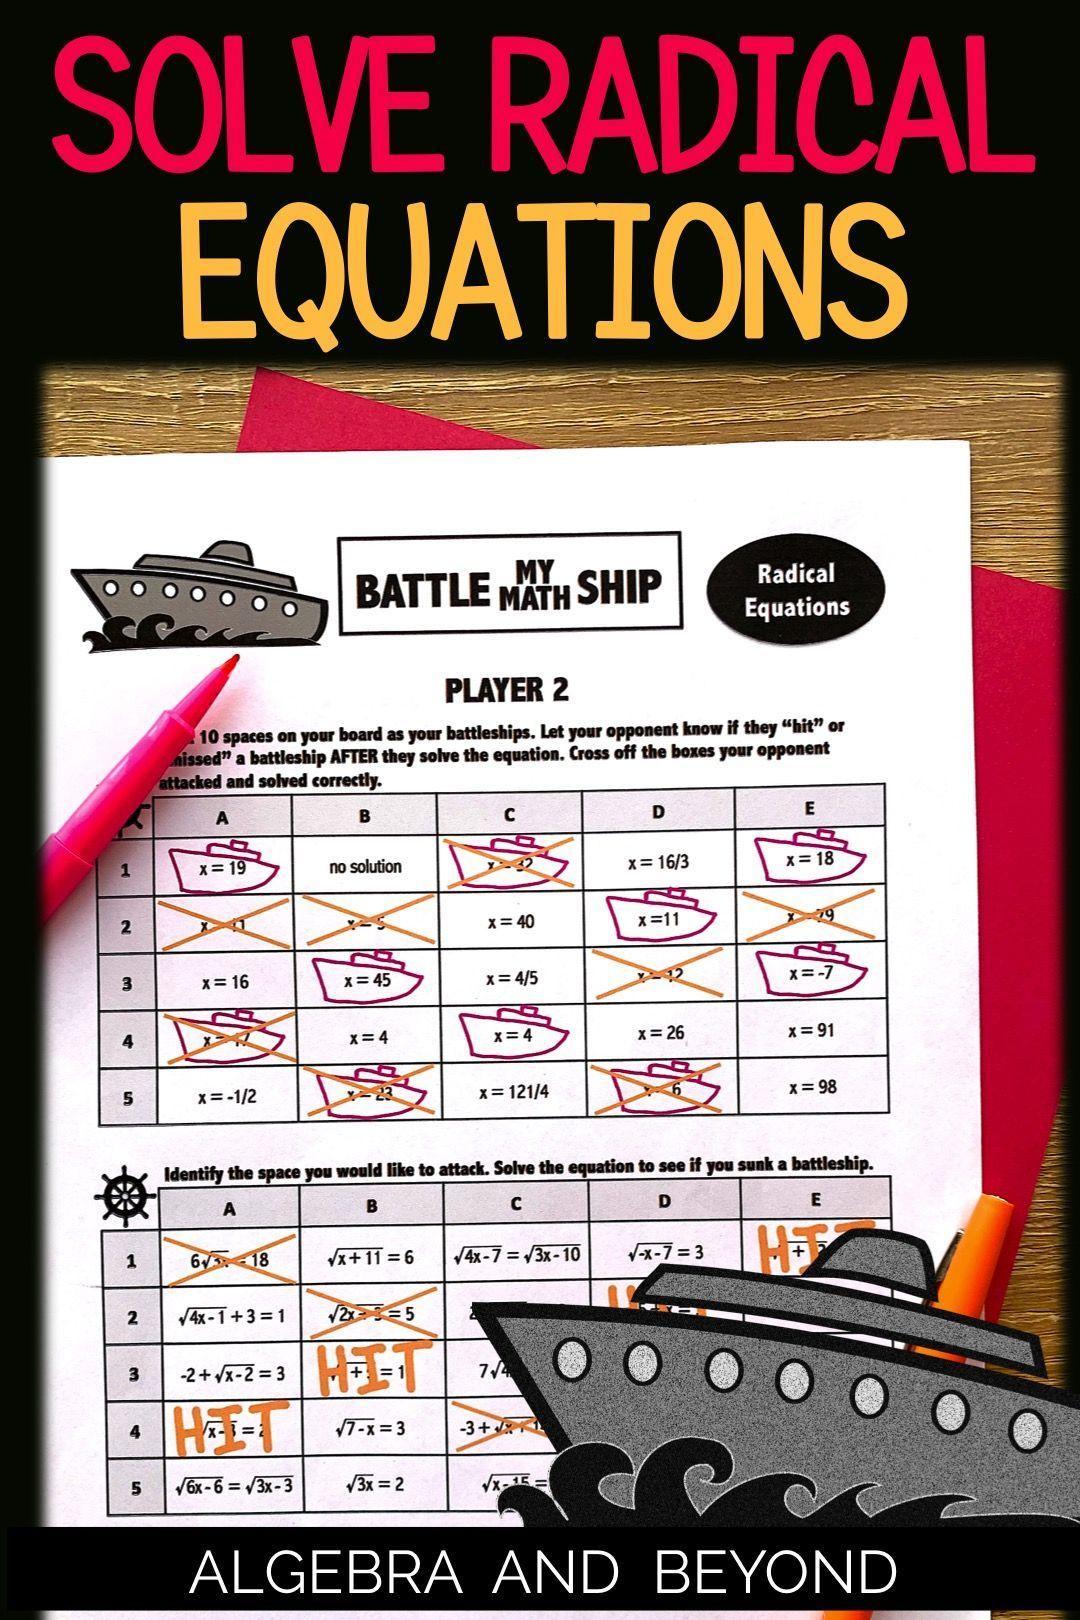 Solving Radical Equations Activity Radical Equations High School Math High School Math Teacher [ 1620 x 1080 Pixel ]